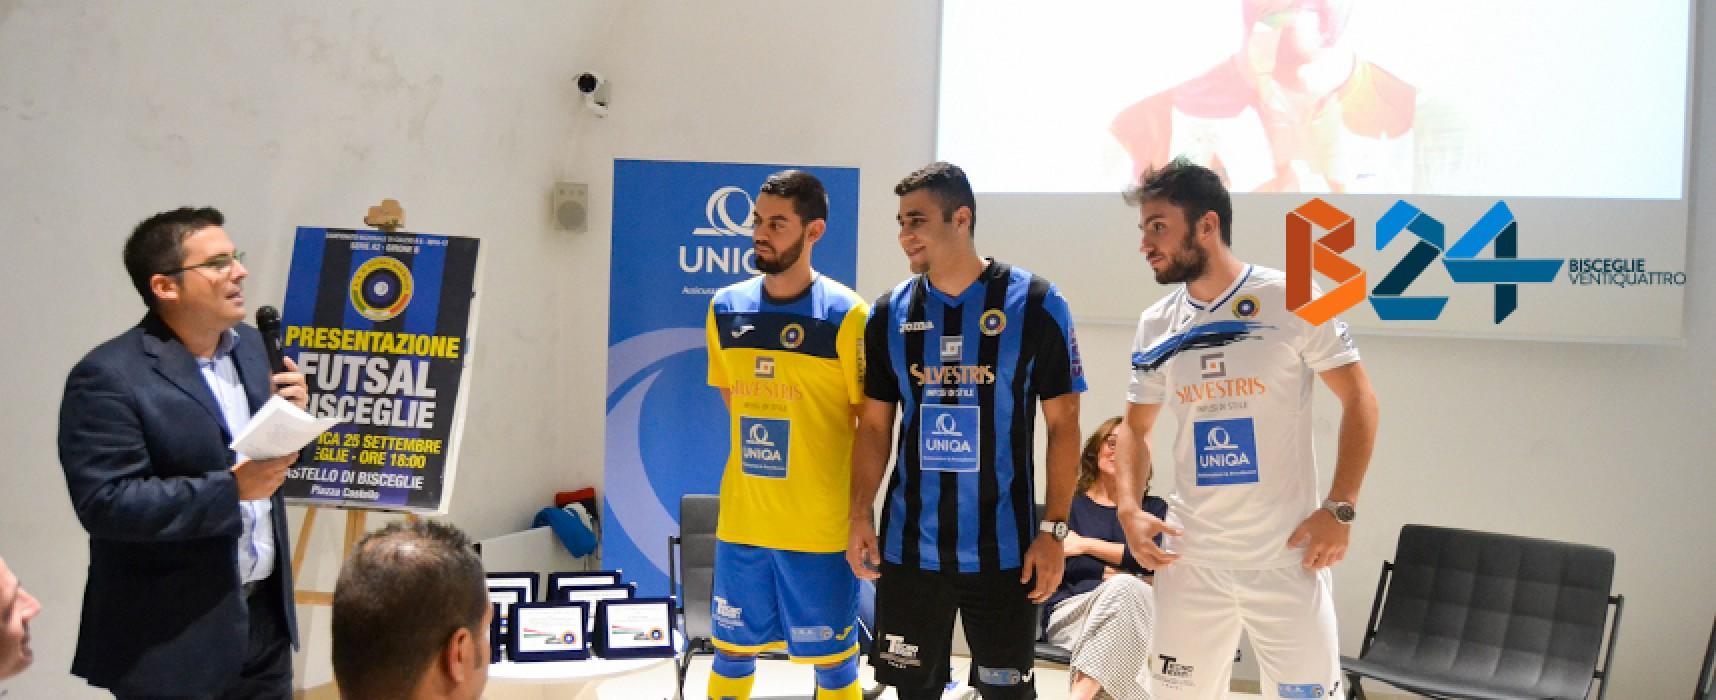 Futsal Bisceglie, buon test contro la Masterfood Macula Nox